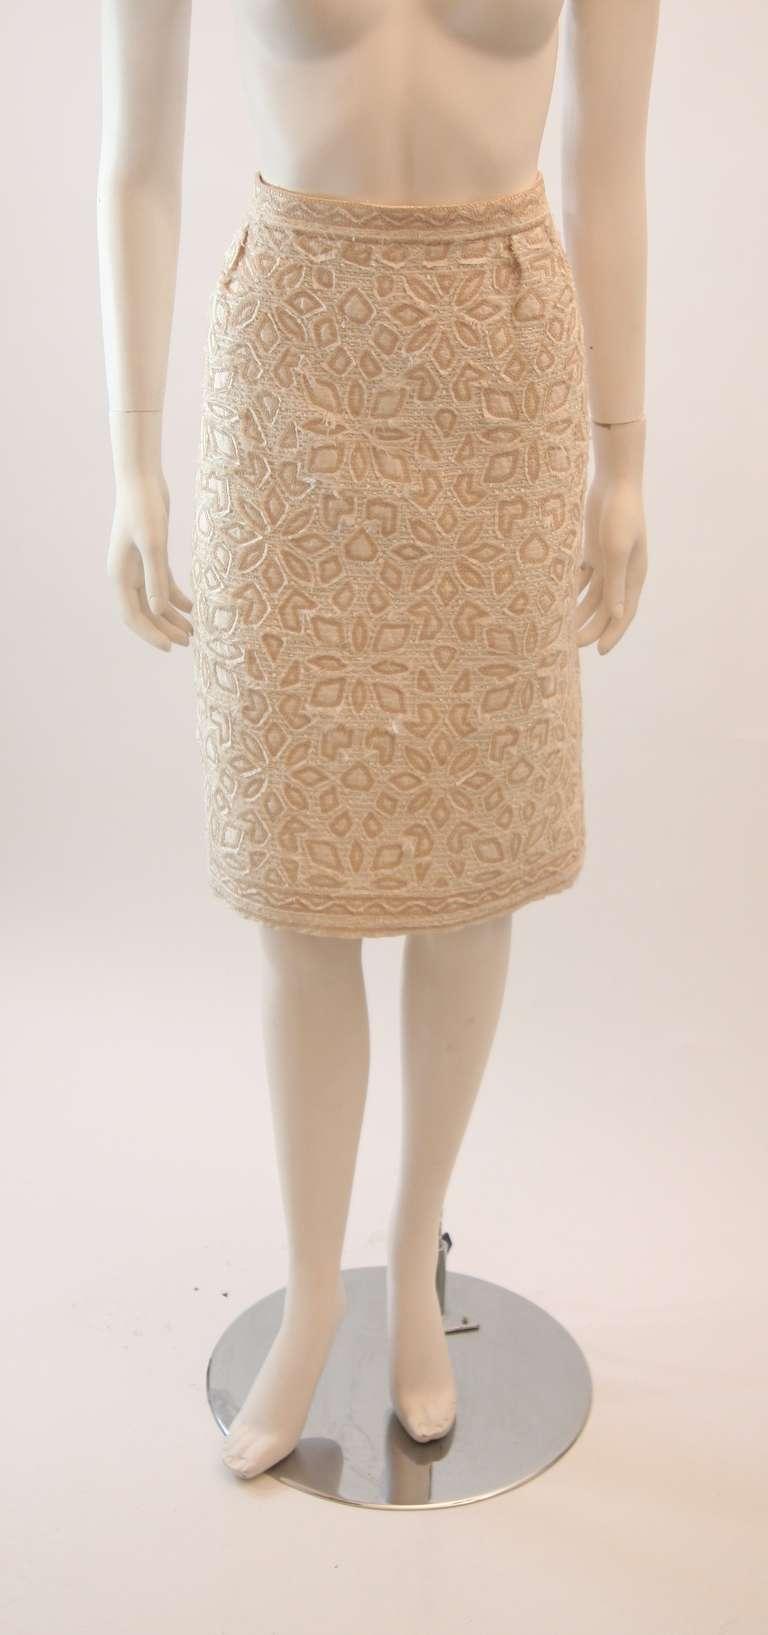 Oscar De La Renta Ivory and Cream Silk Blouse and Skirt Set Size 10 7